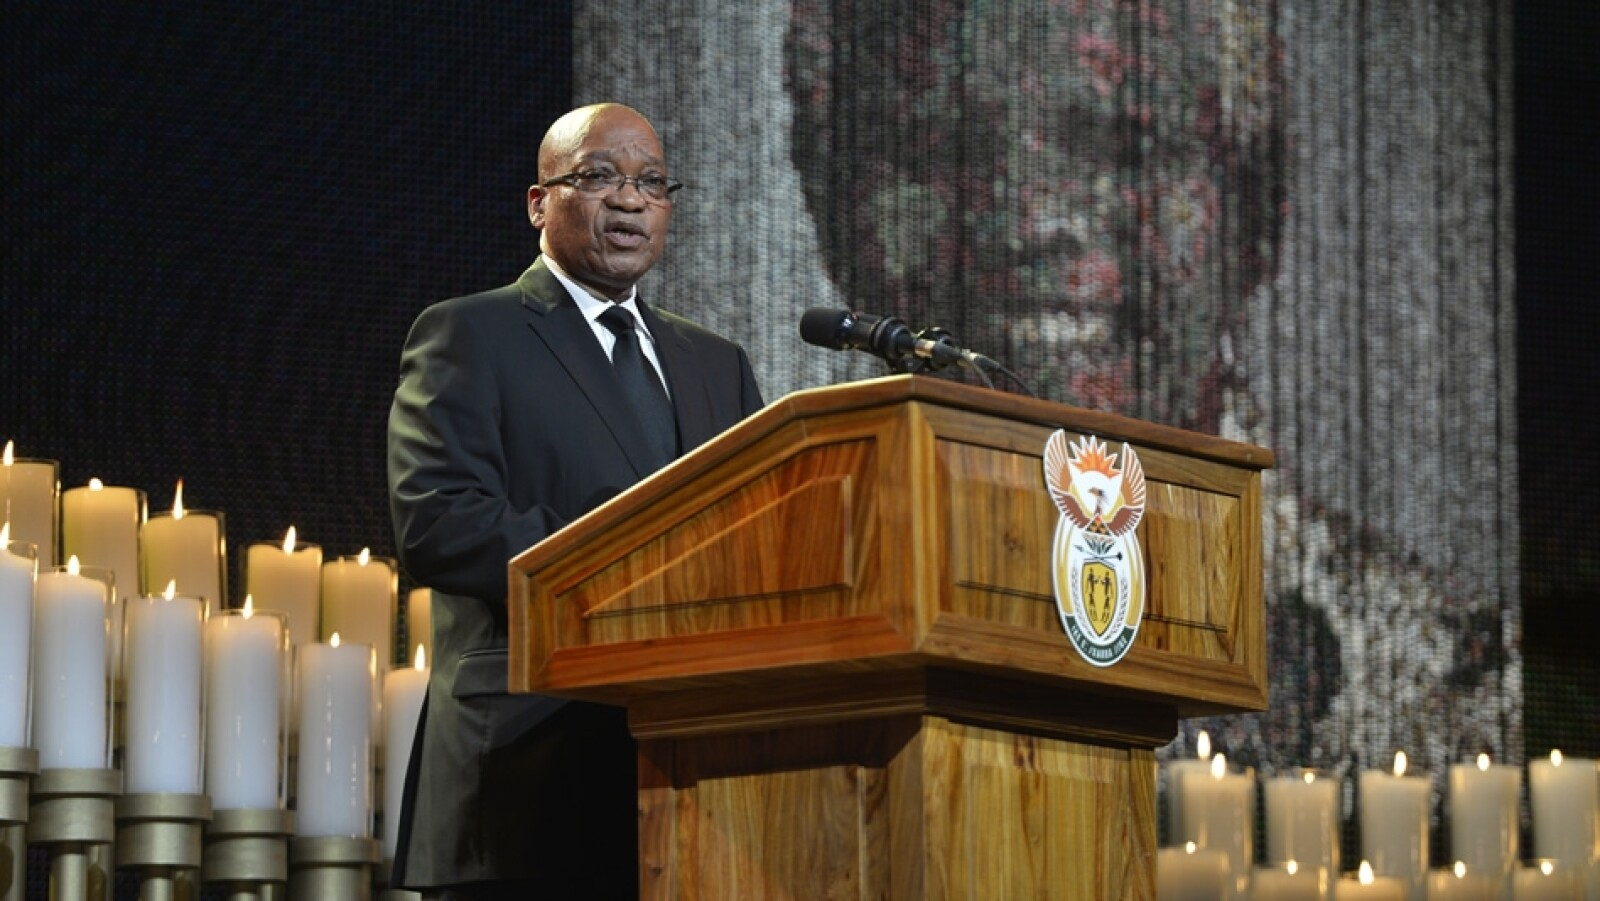 presidente jacob zuma funeral nelson mandela